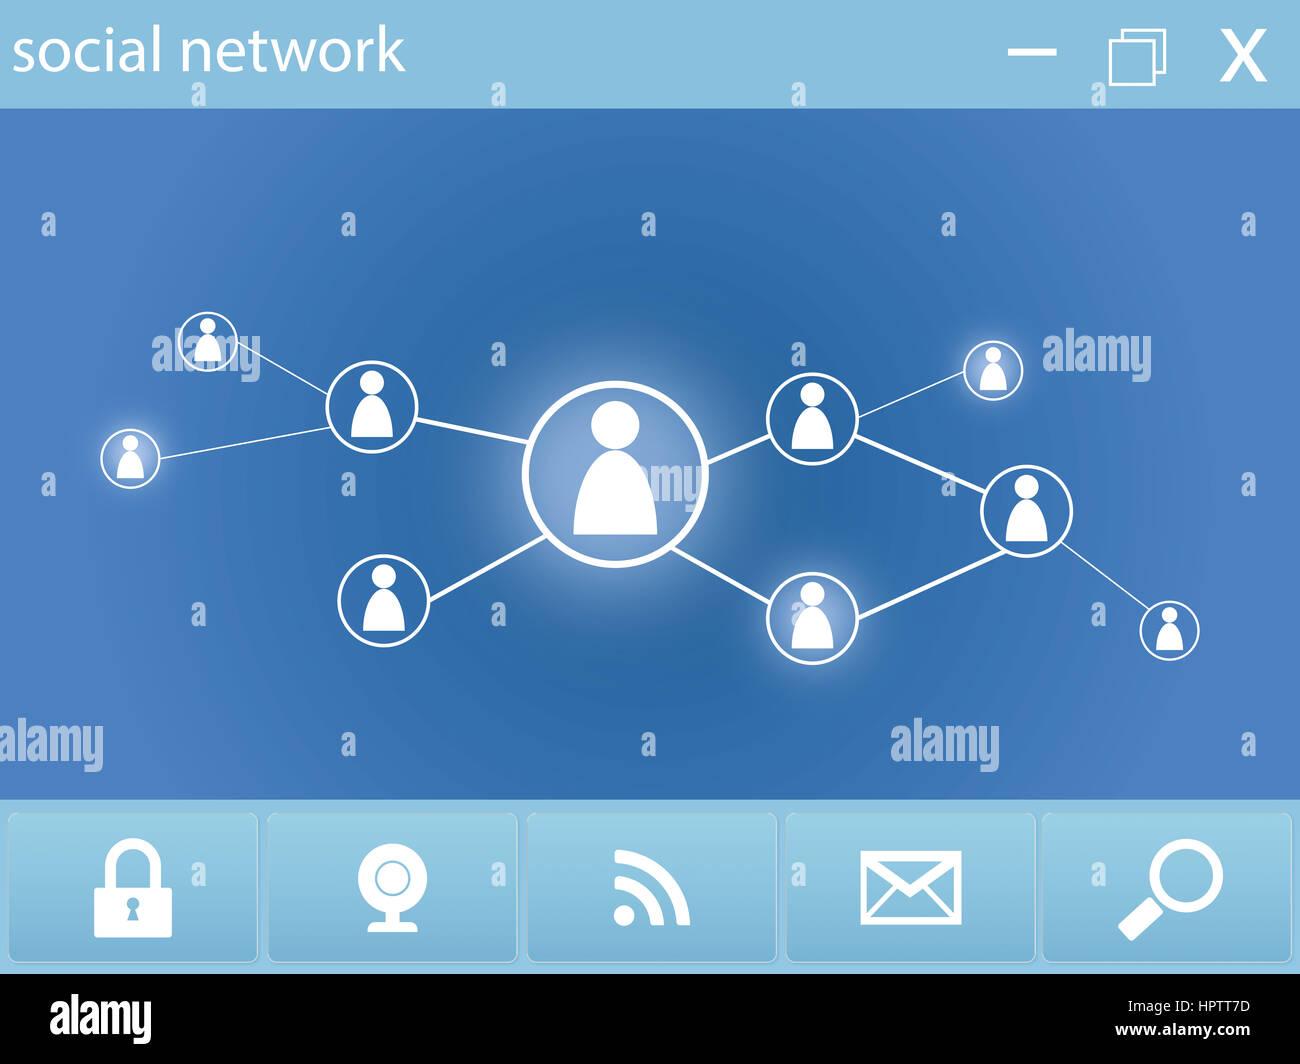 social network webpage - Stock Image